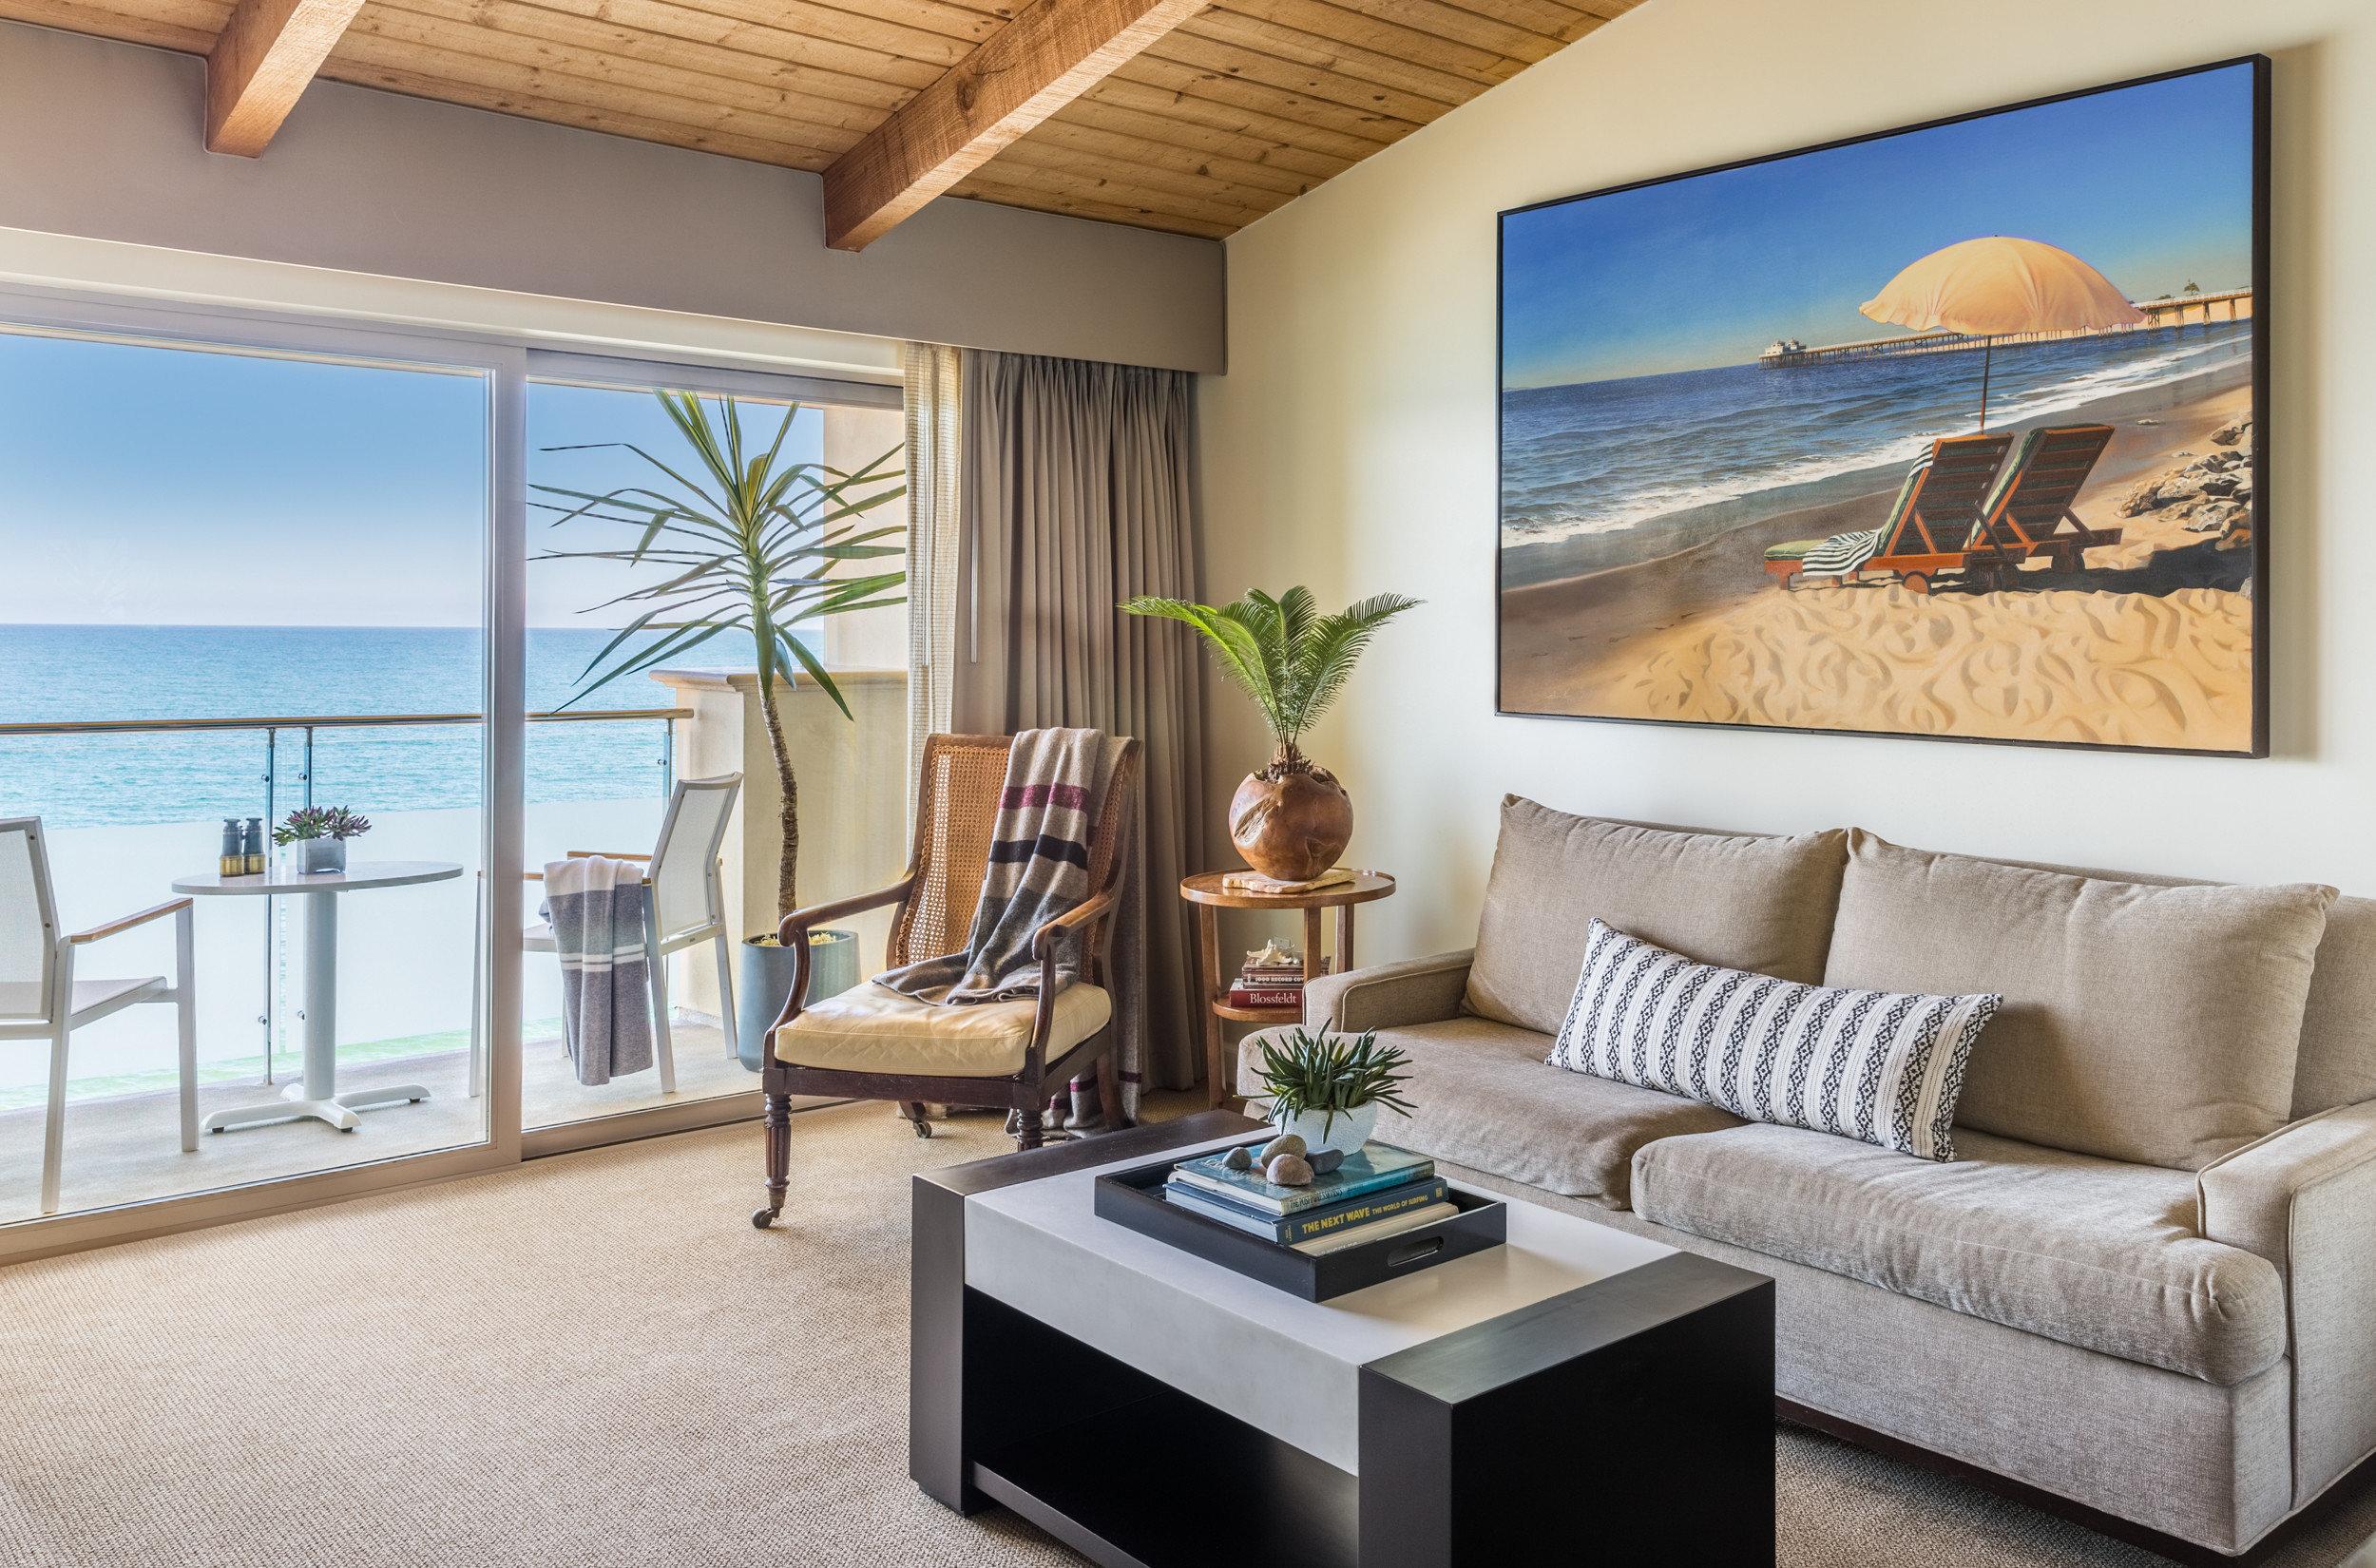 sofa living room property home screen condominium flat Modern